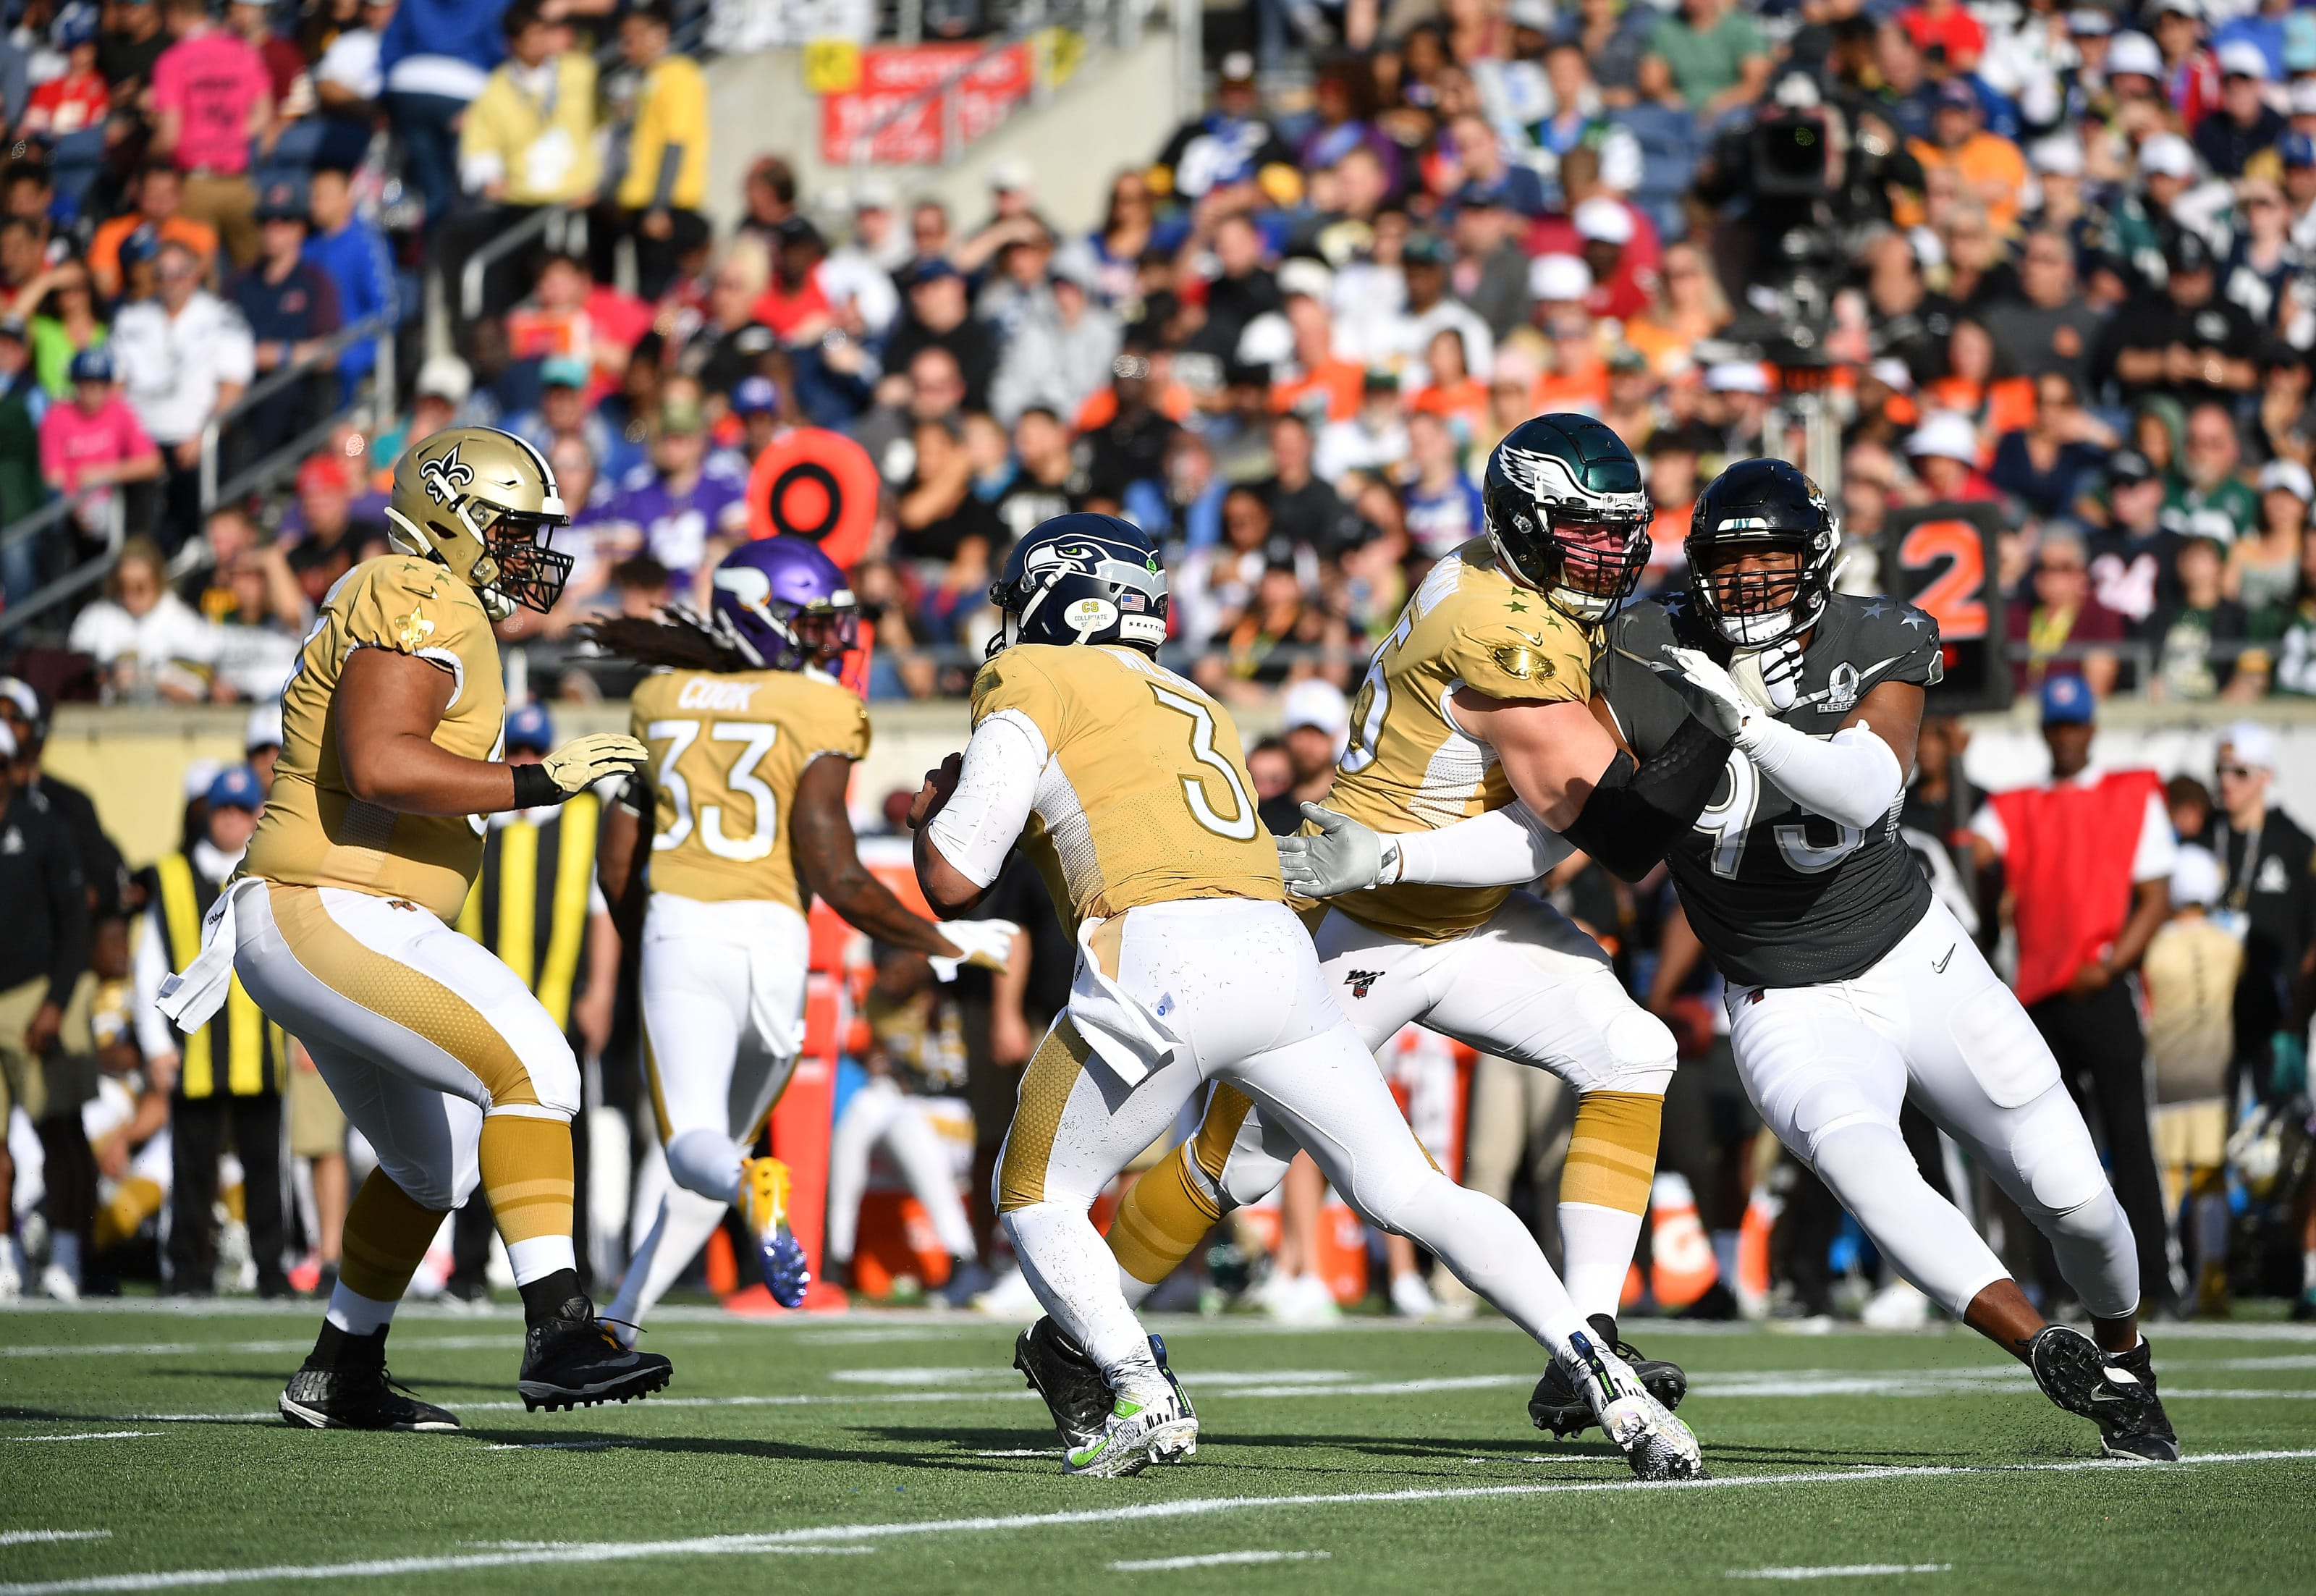 Minnesota Vikings 3 Takeaways From 2020 Nfl Pro Bowl